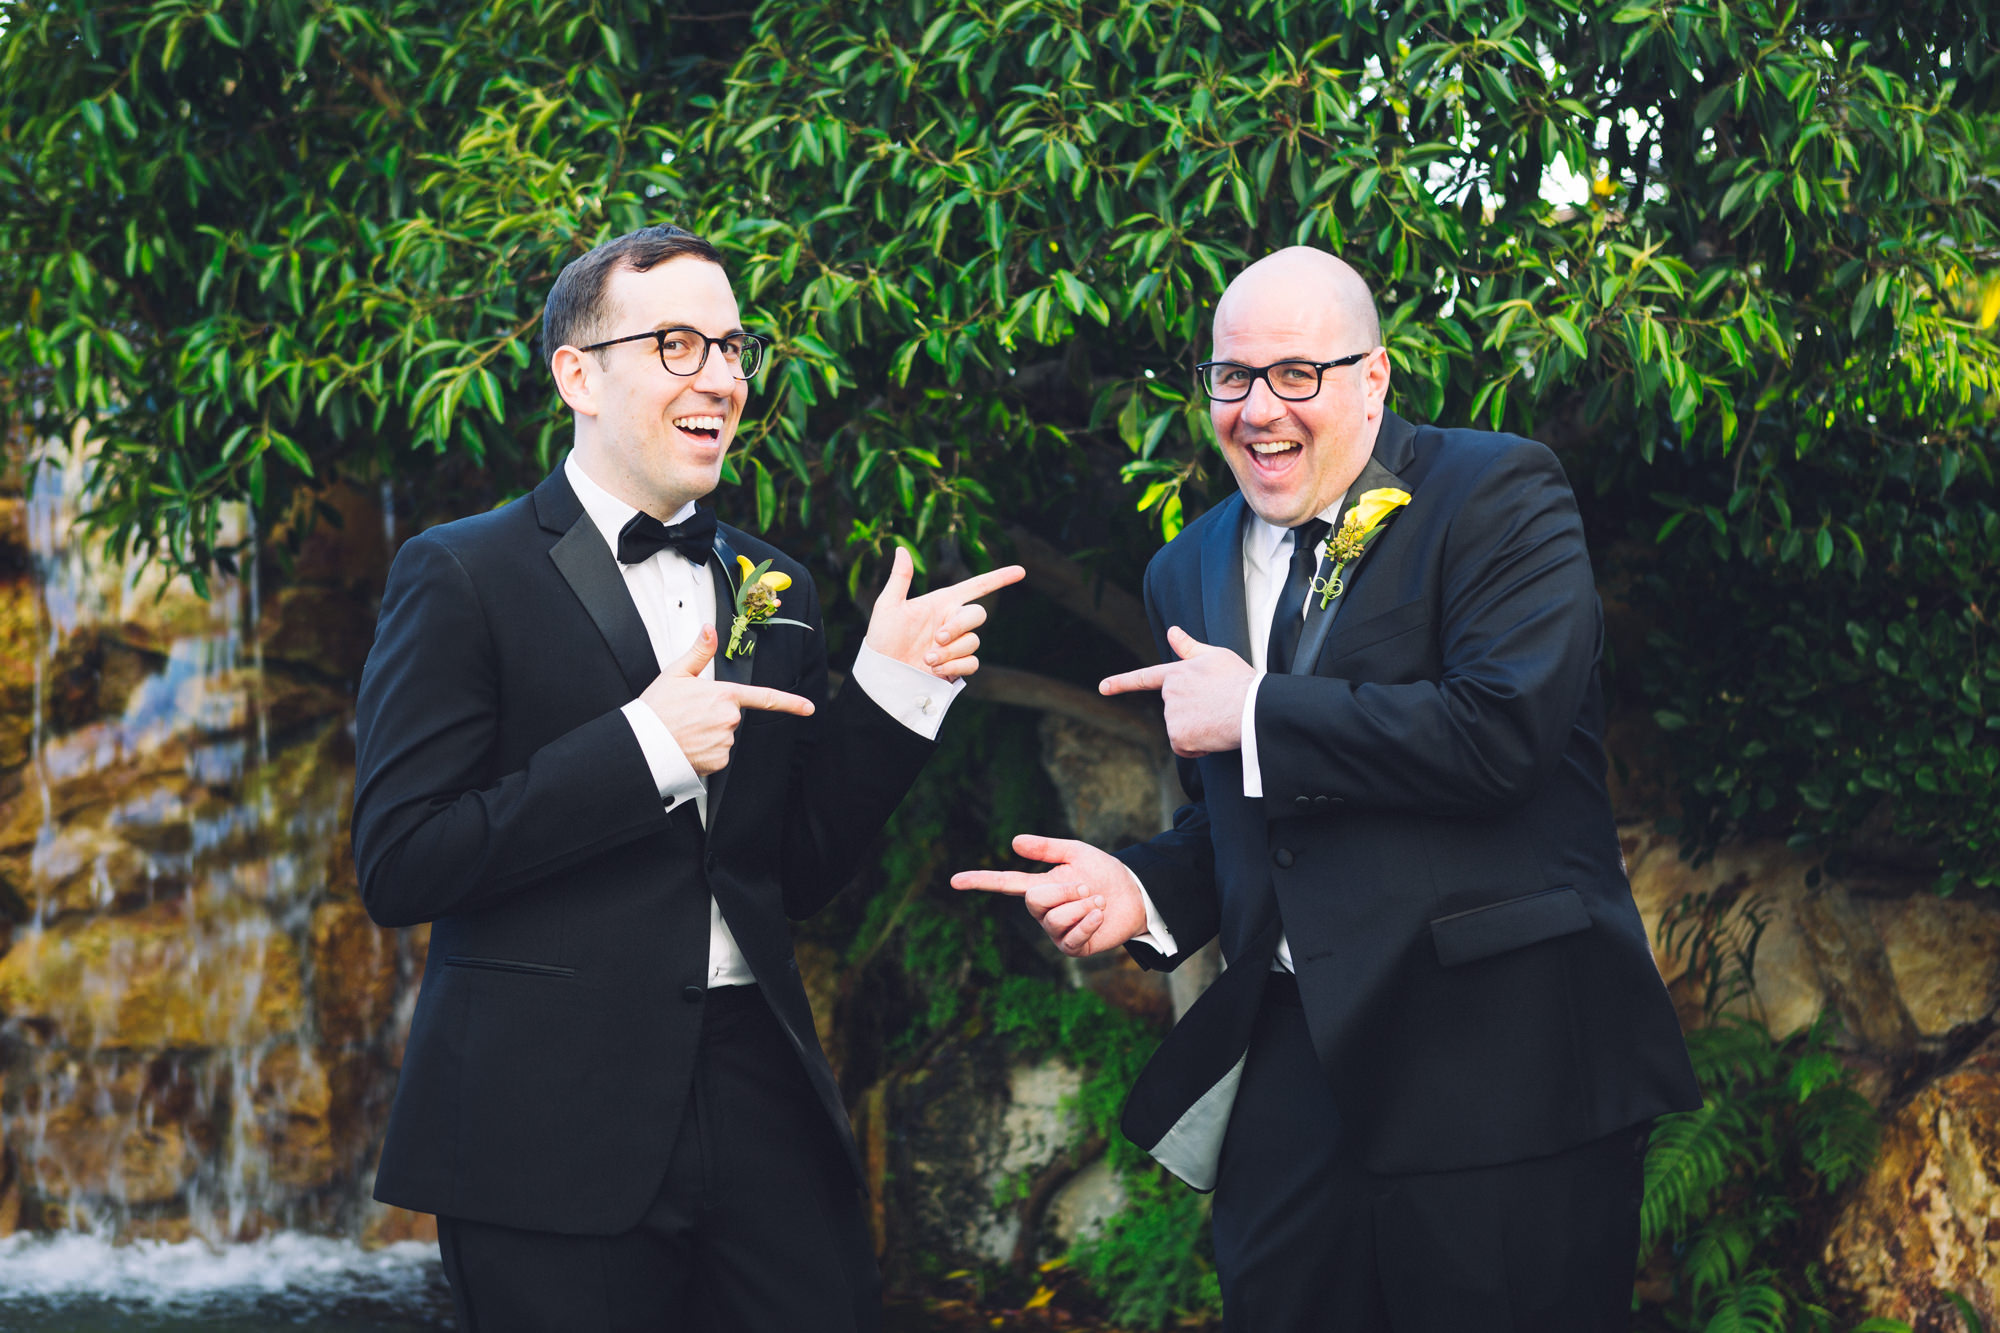 thelightandglass-wedding-engagement-photography-073.jpg